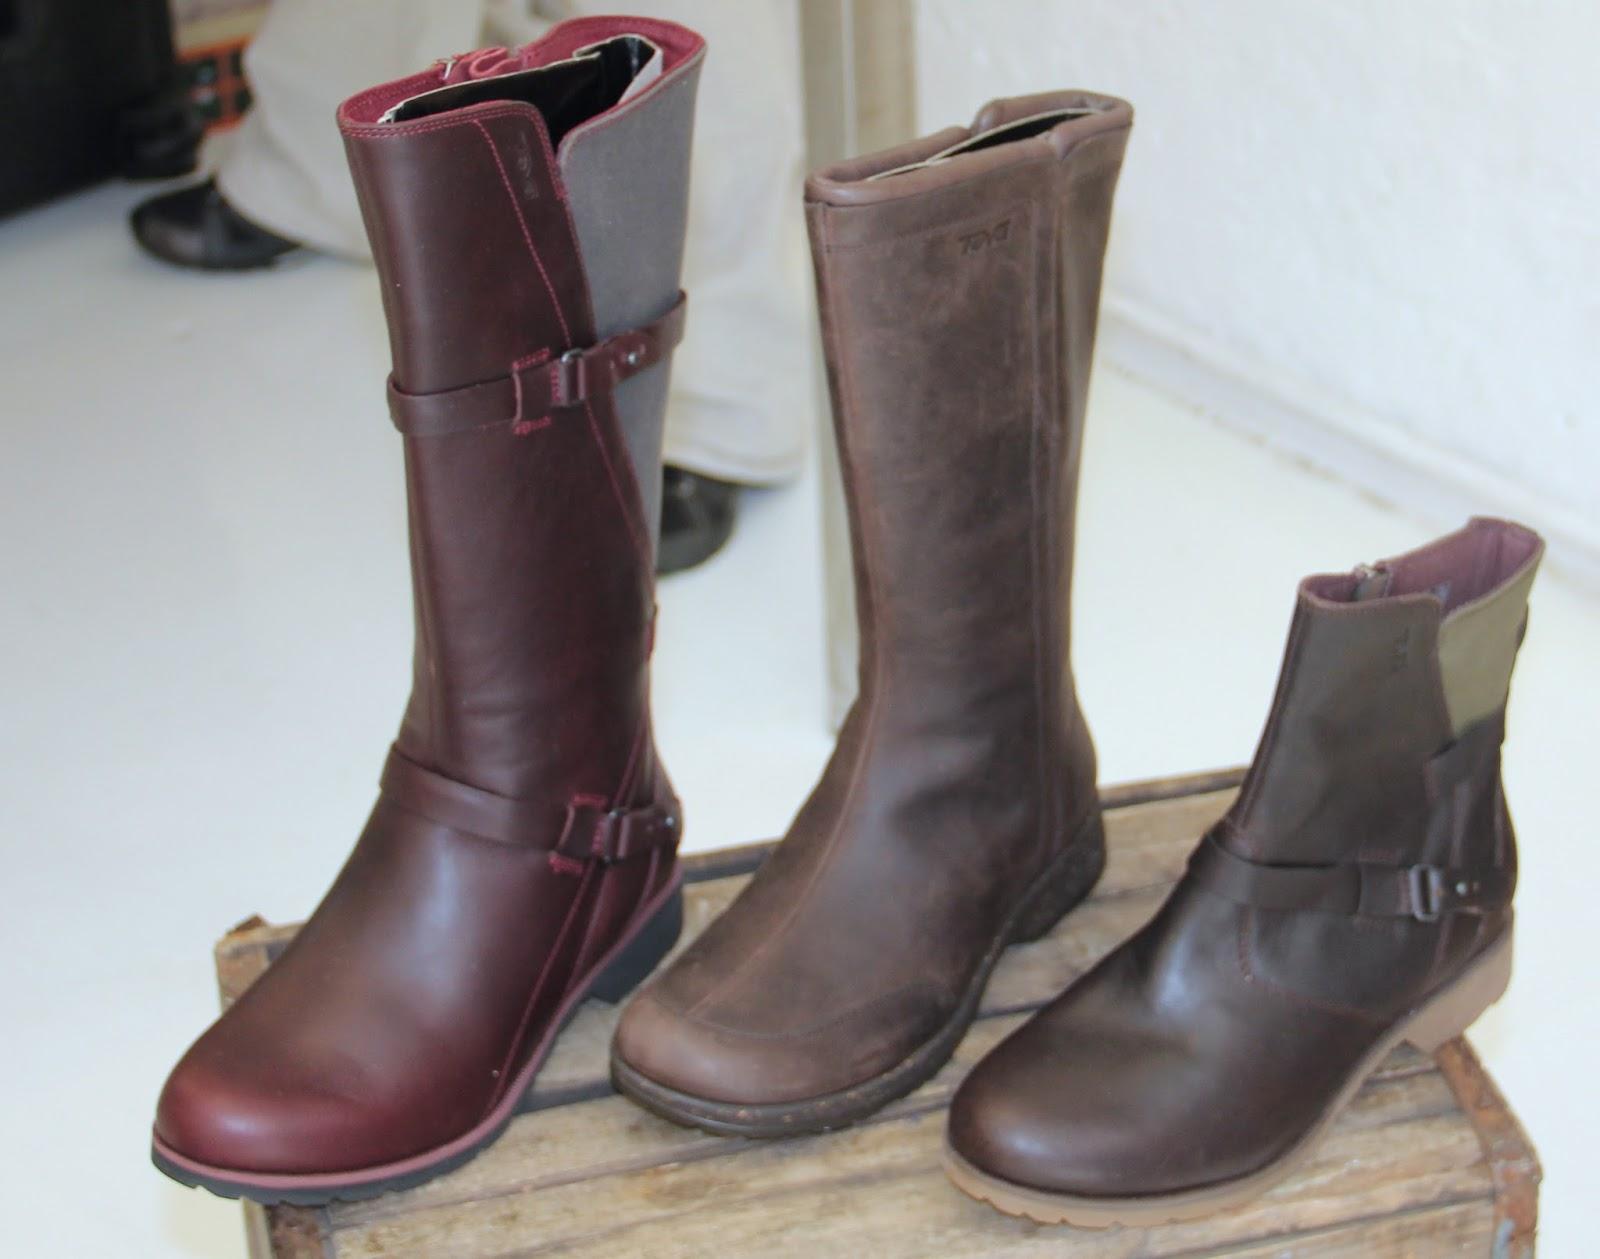 Women's left-De La Vina Boot leather/canvas w/ Spider 365 Rubber sole for  grip, waterproof upper, adustable strap for great fit, side zip ez on/off.